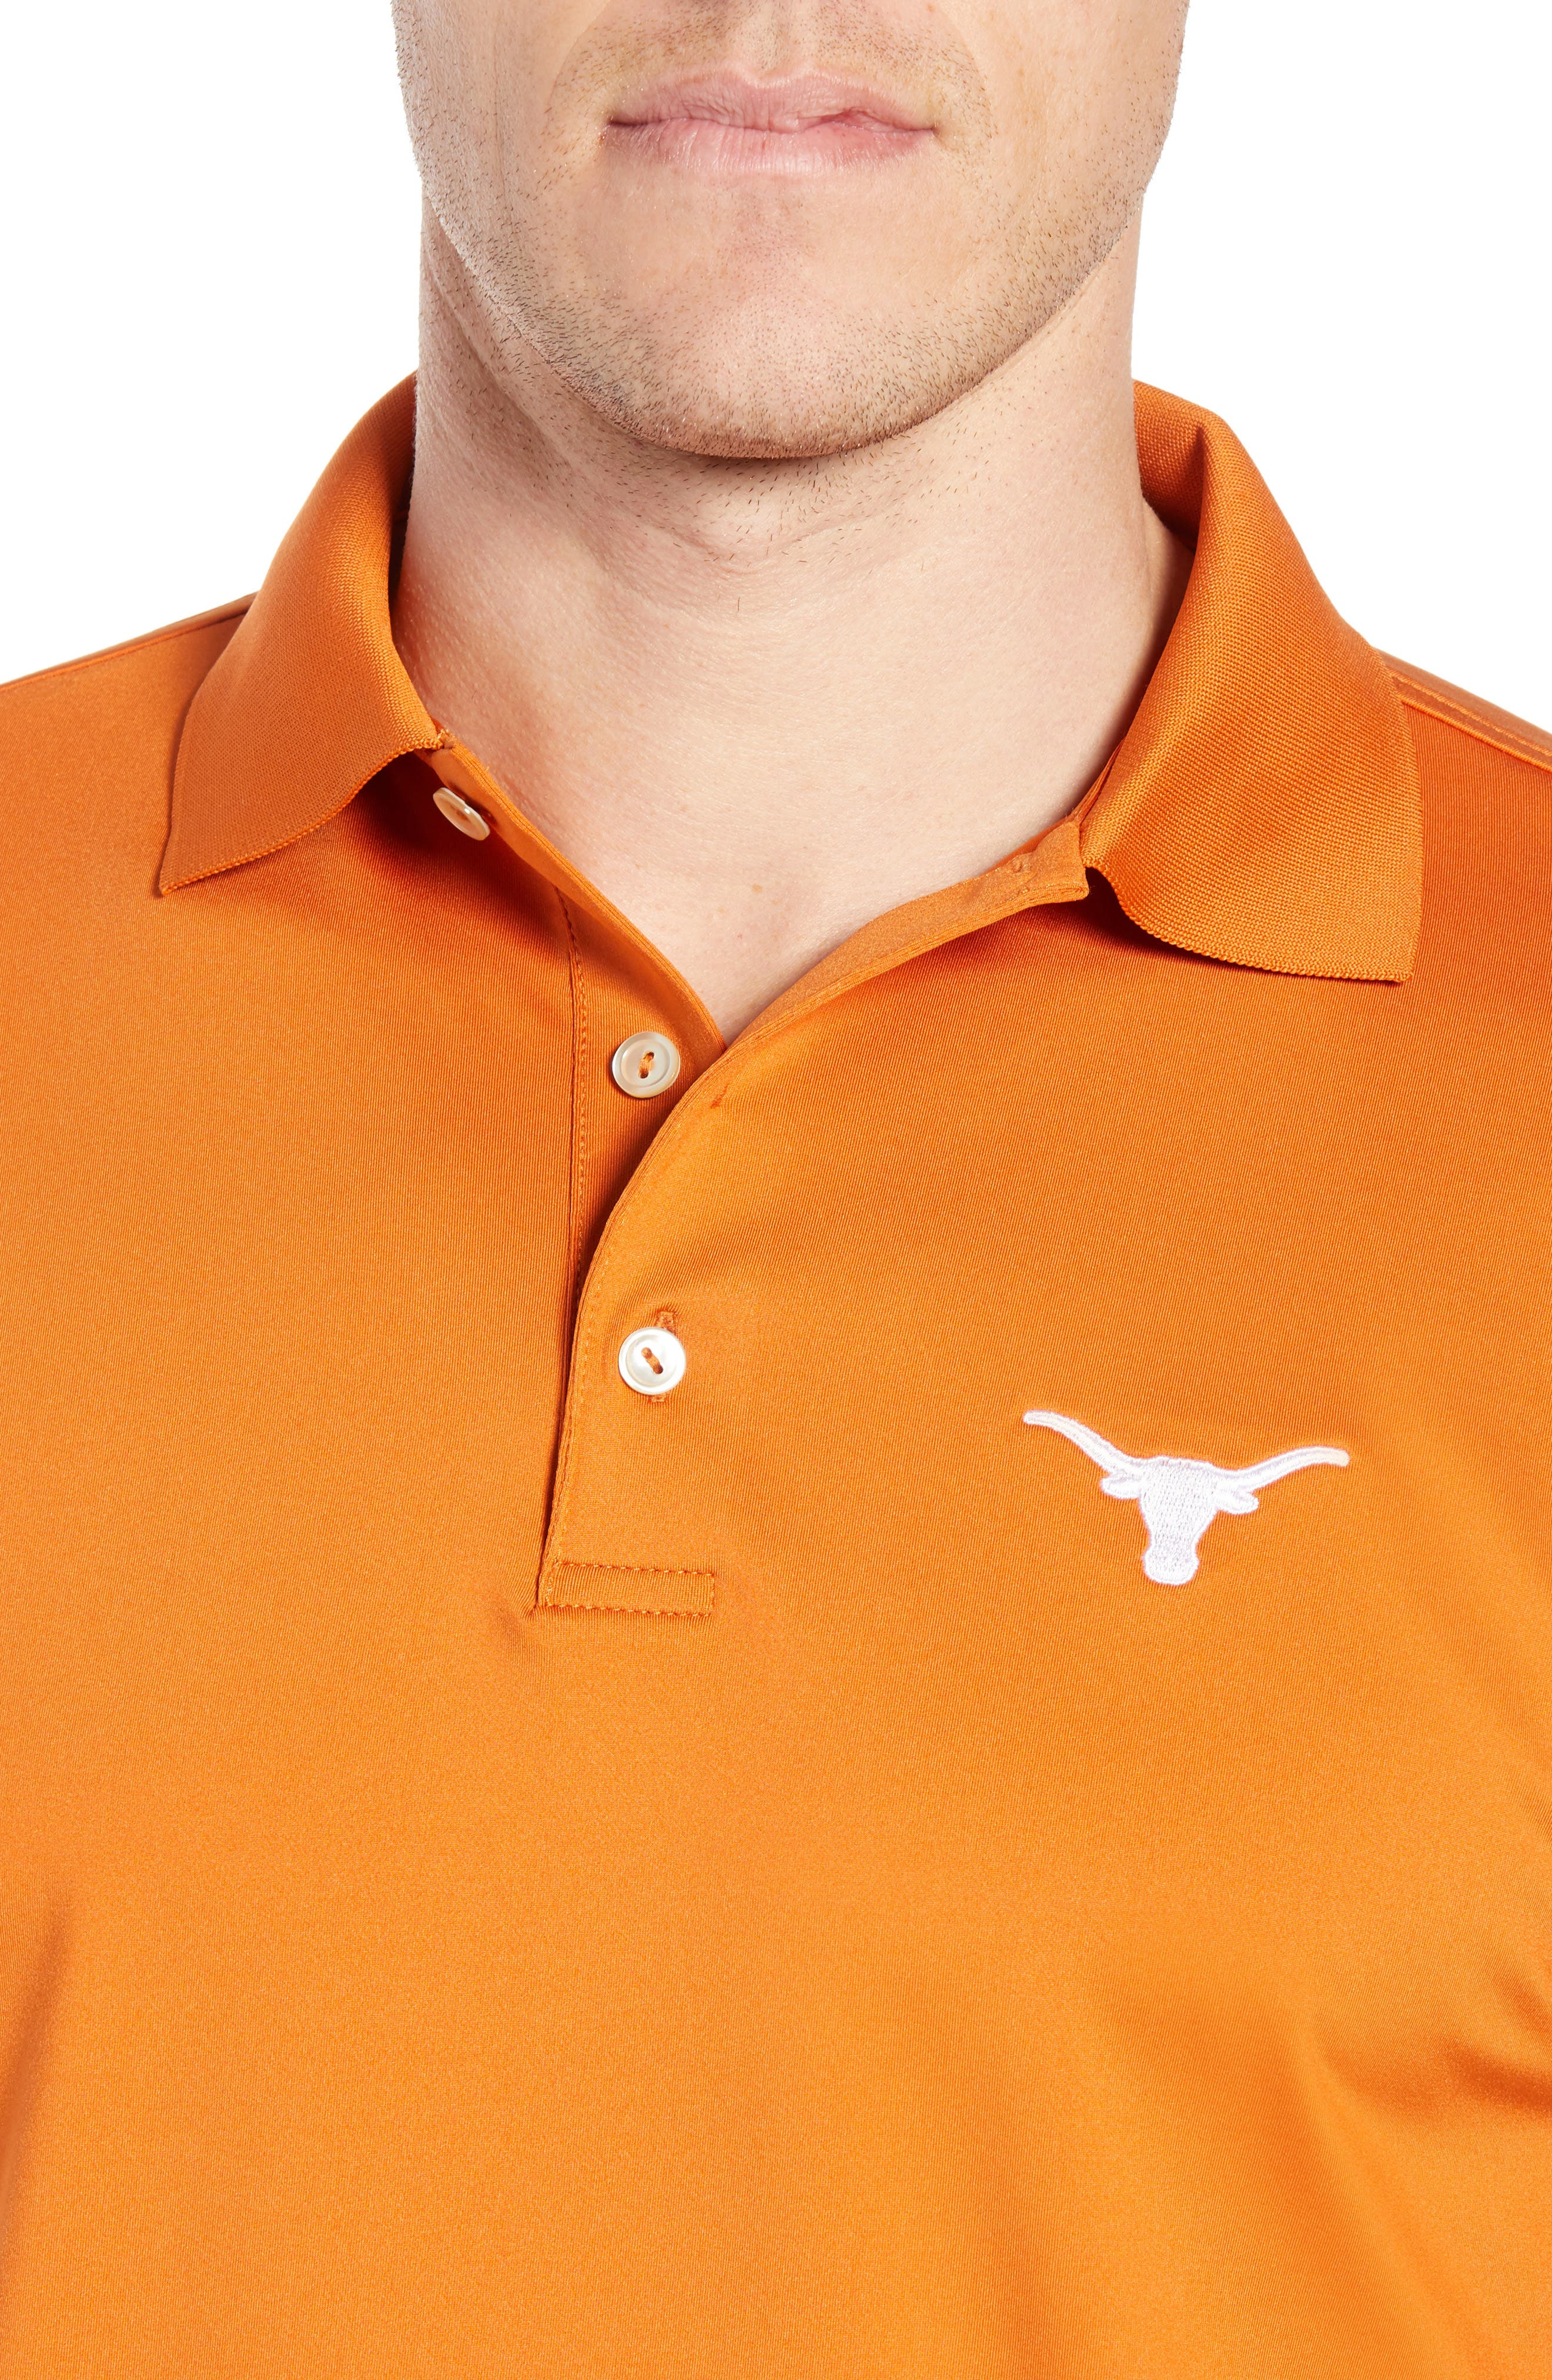 Texas Solid Performance Polo Shirt,                             Alternate thumbnail 4, color,                             600